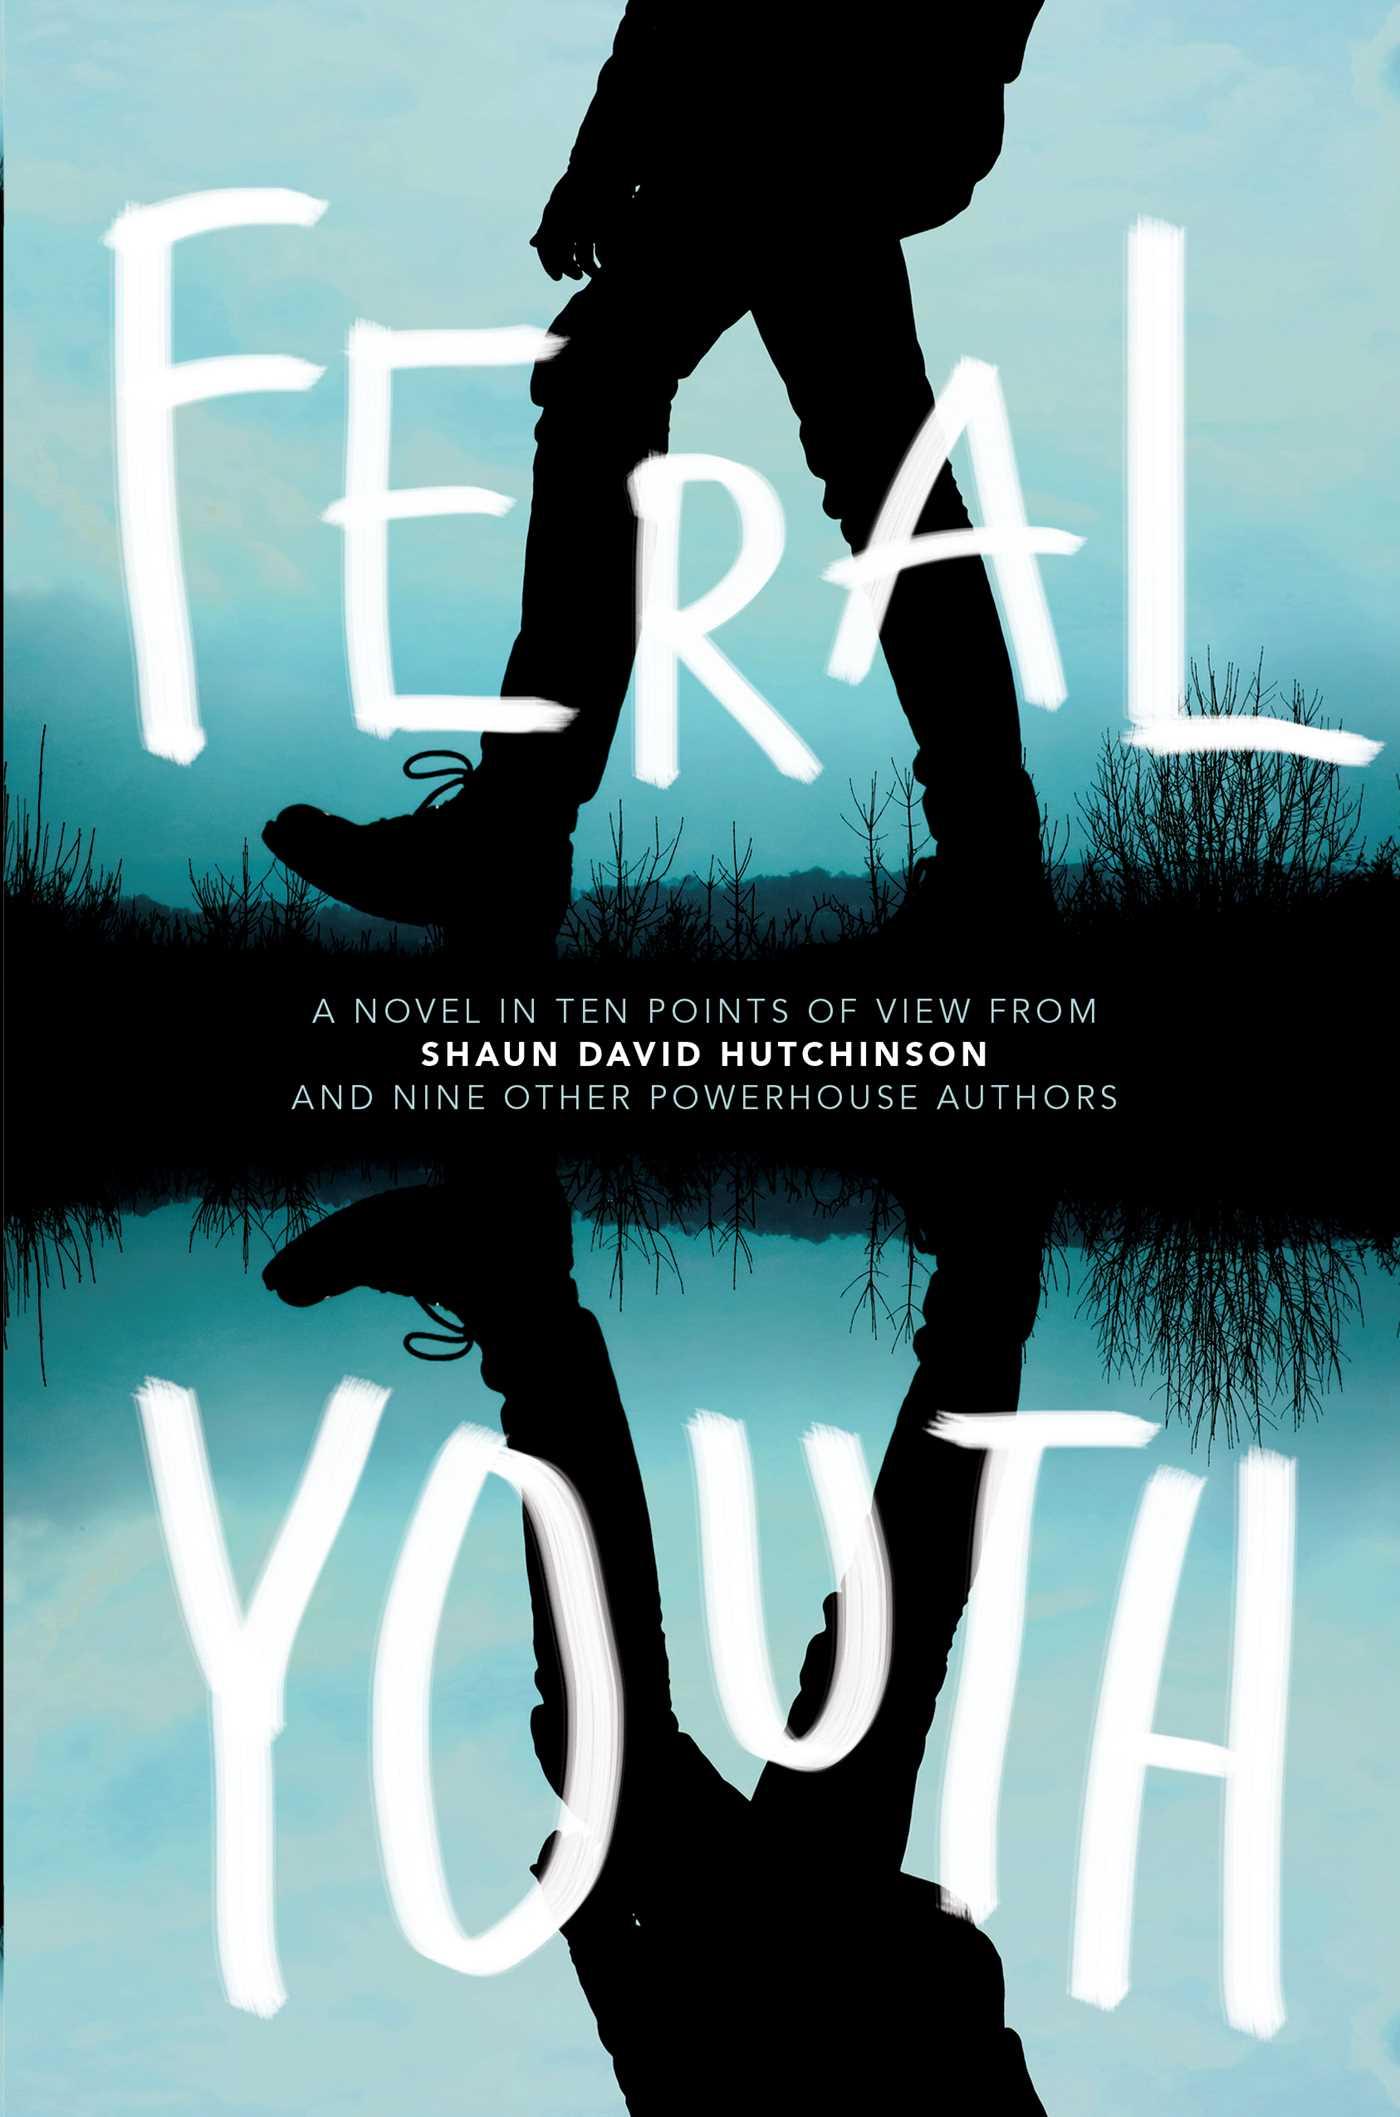 Feral youth 9781481491129 hr